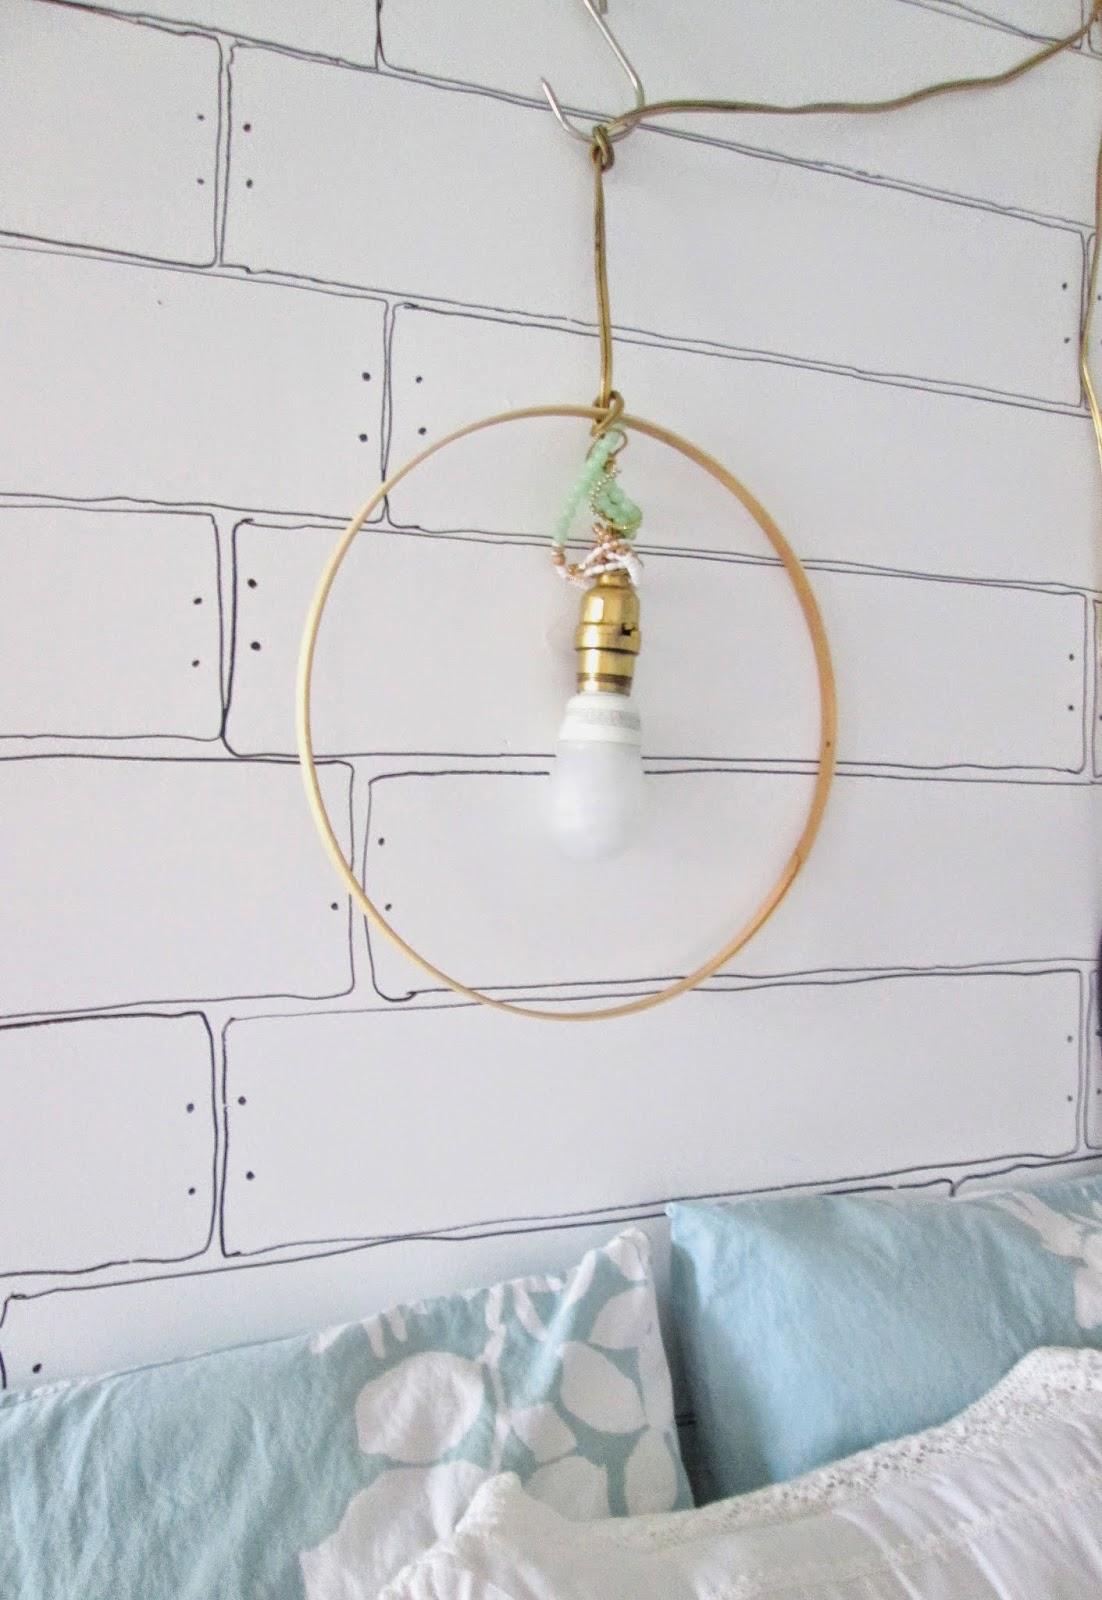 hung+light6.jpg